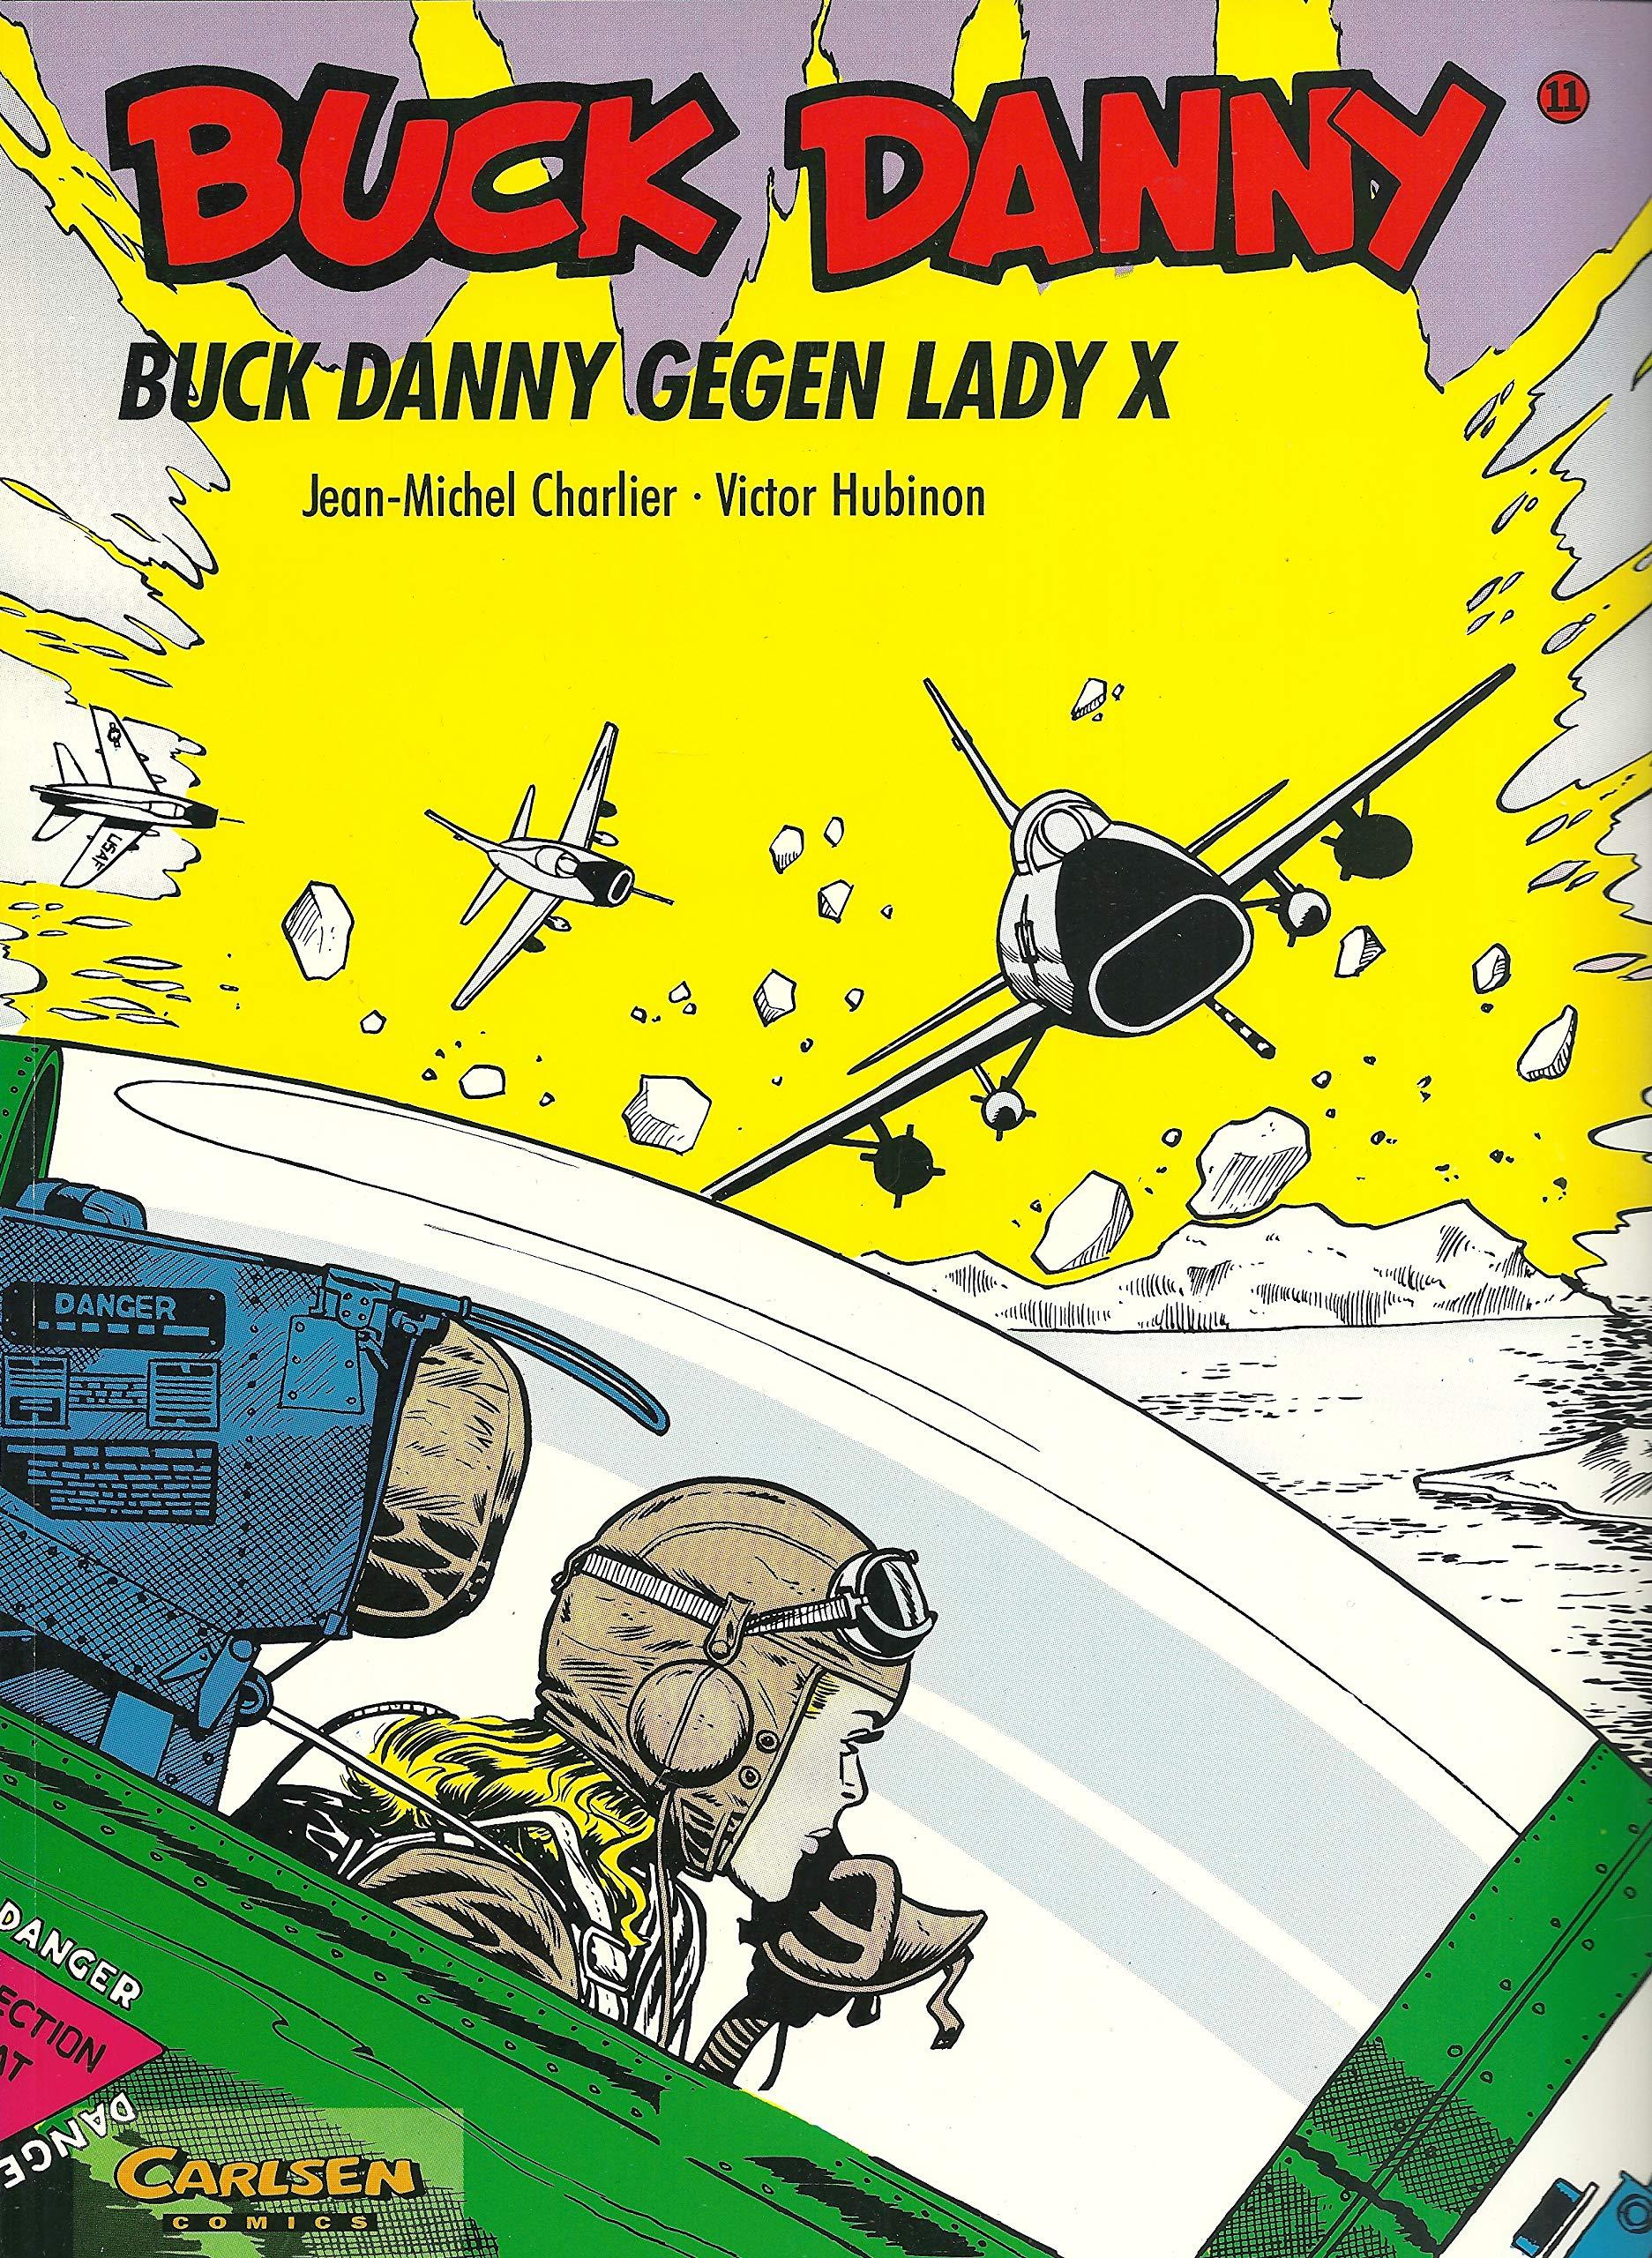 Buck Danny Carlsen Comics Bd 11 Buck Danny Gegen Lady X Amazon De Charlier Jean M Hubinon Victor Bucher